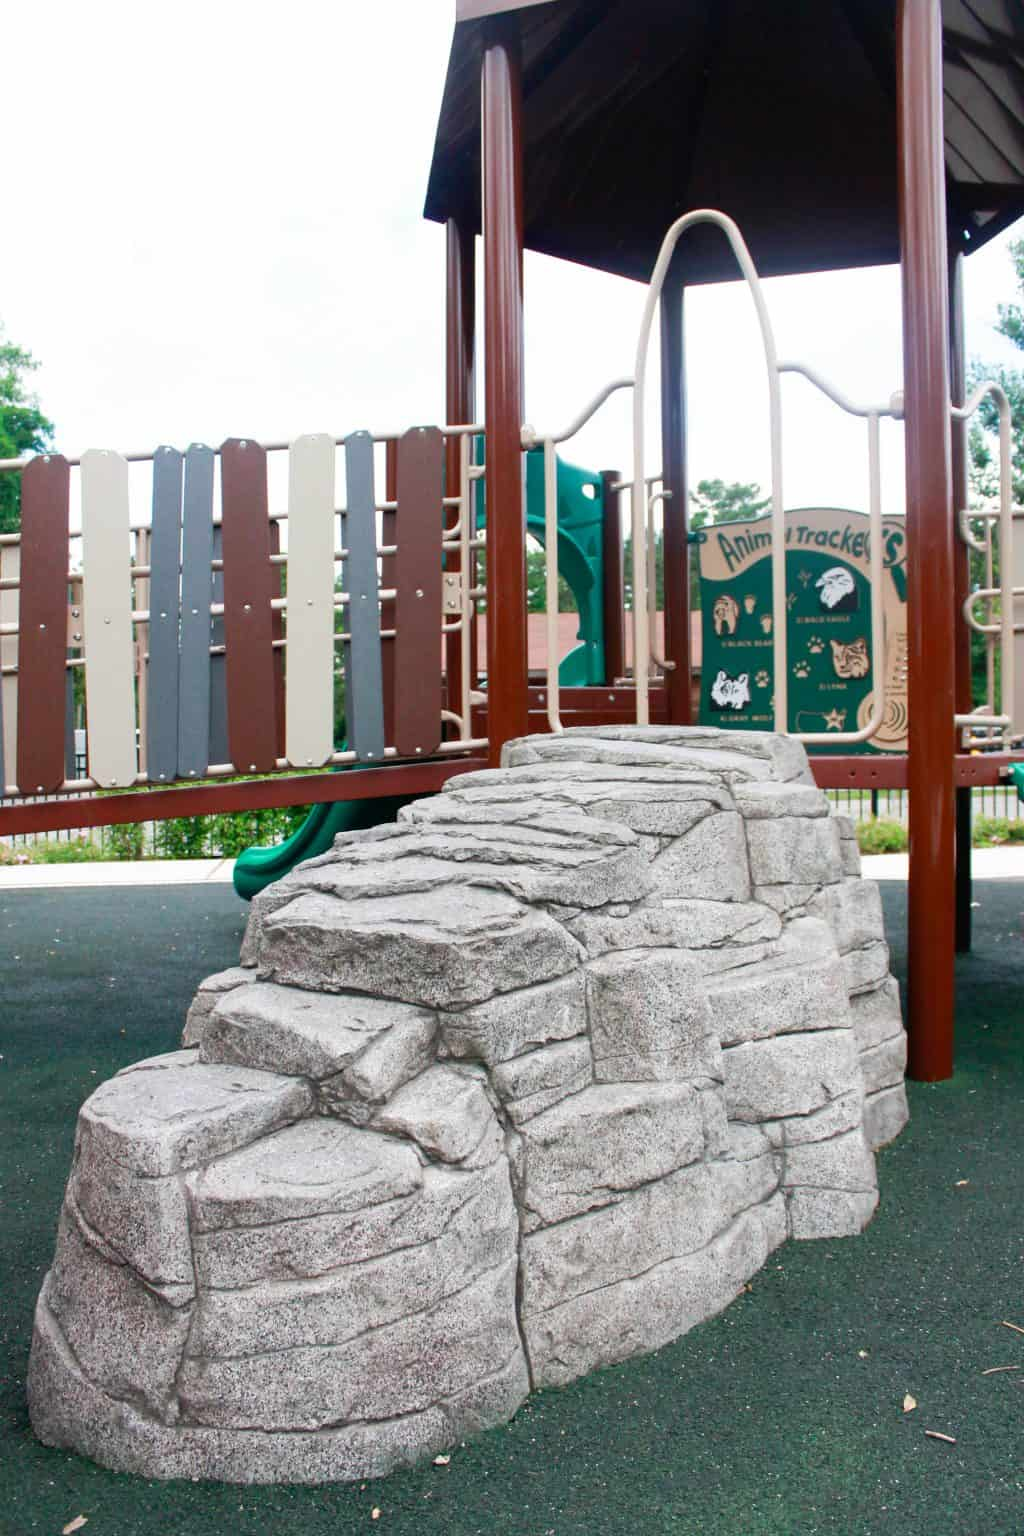 windward-beach-park-playground-brick-nj_27651421493_o-1024x1536